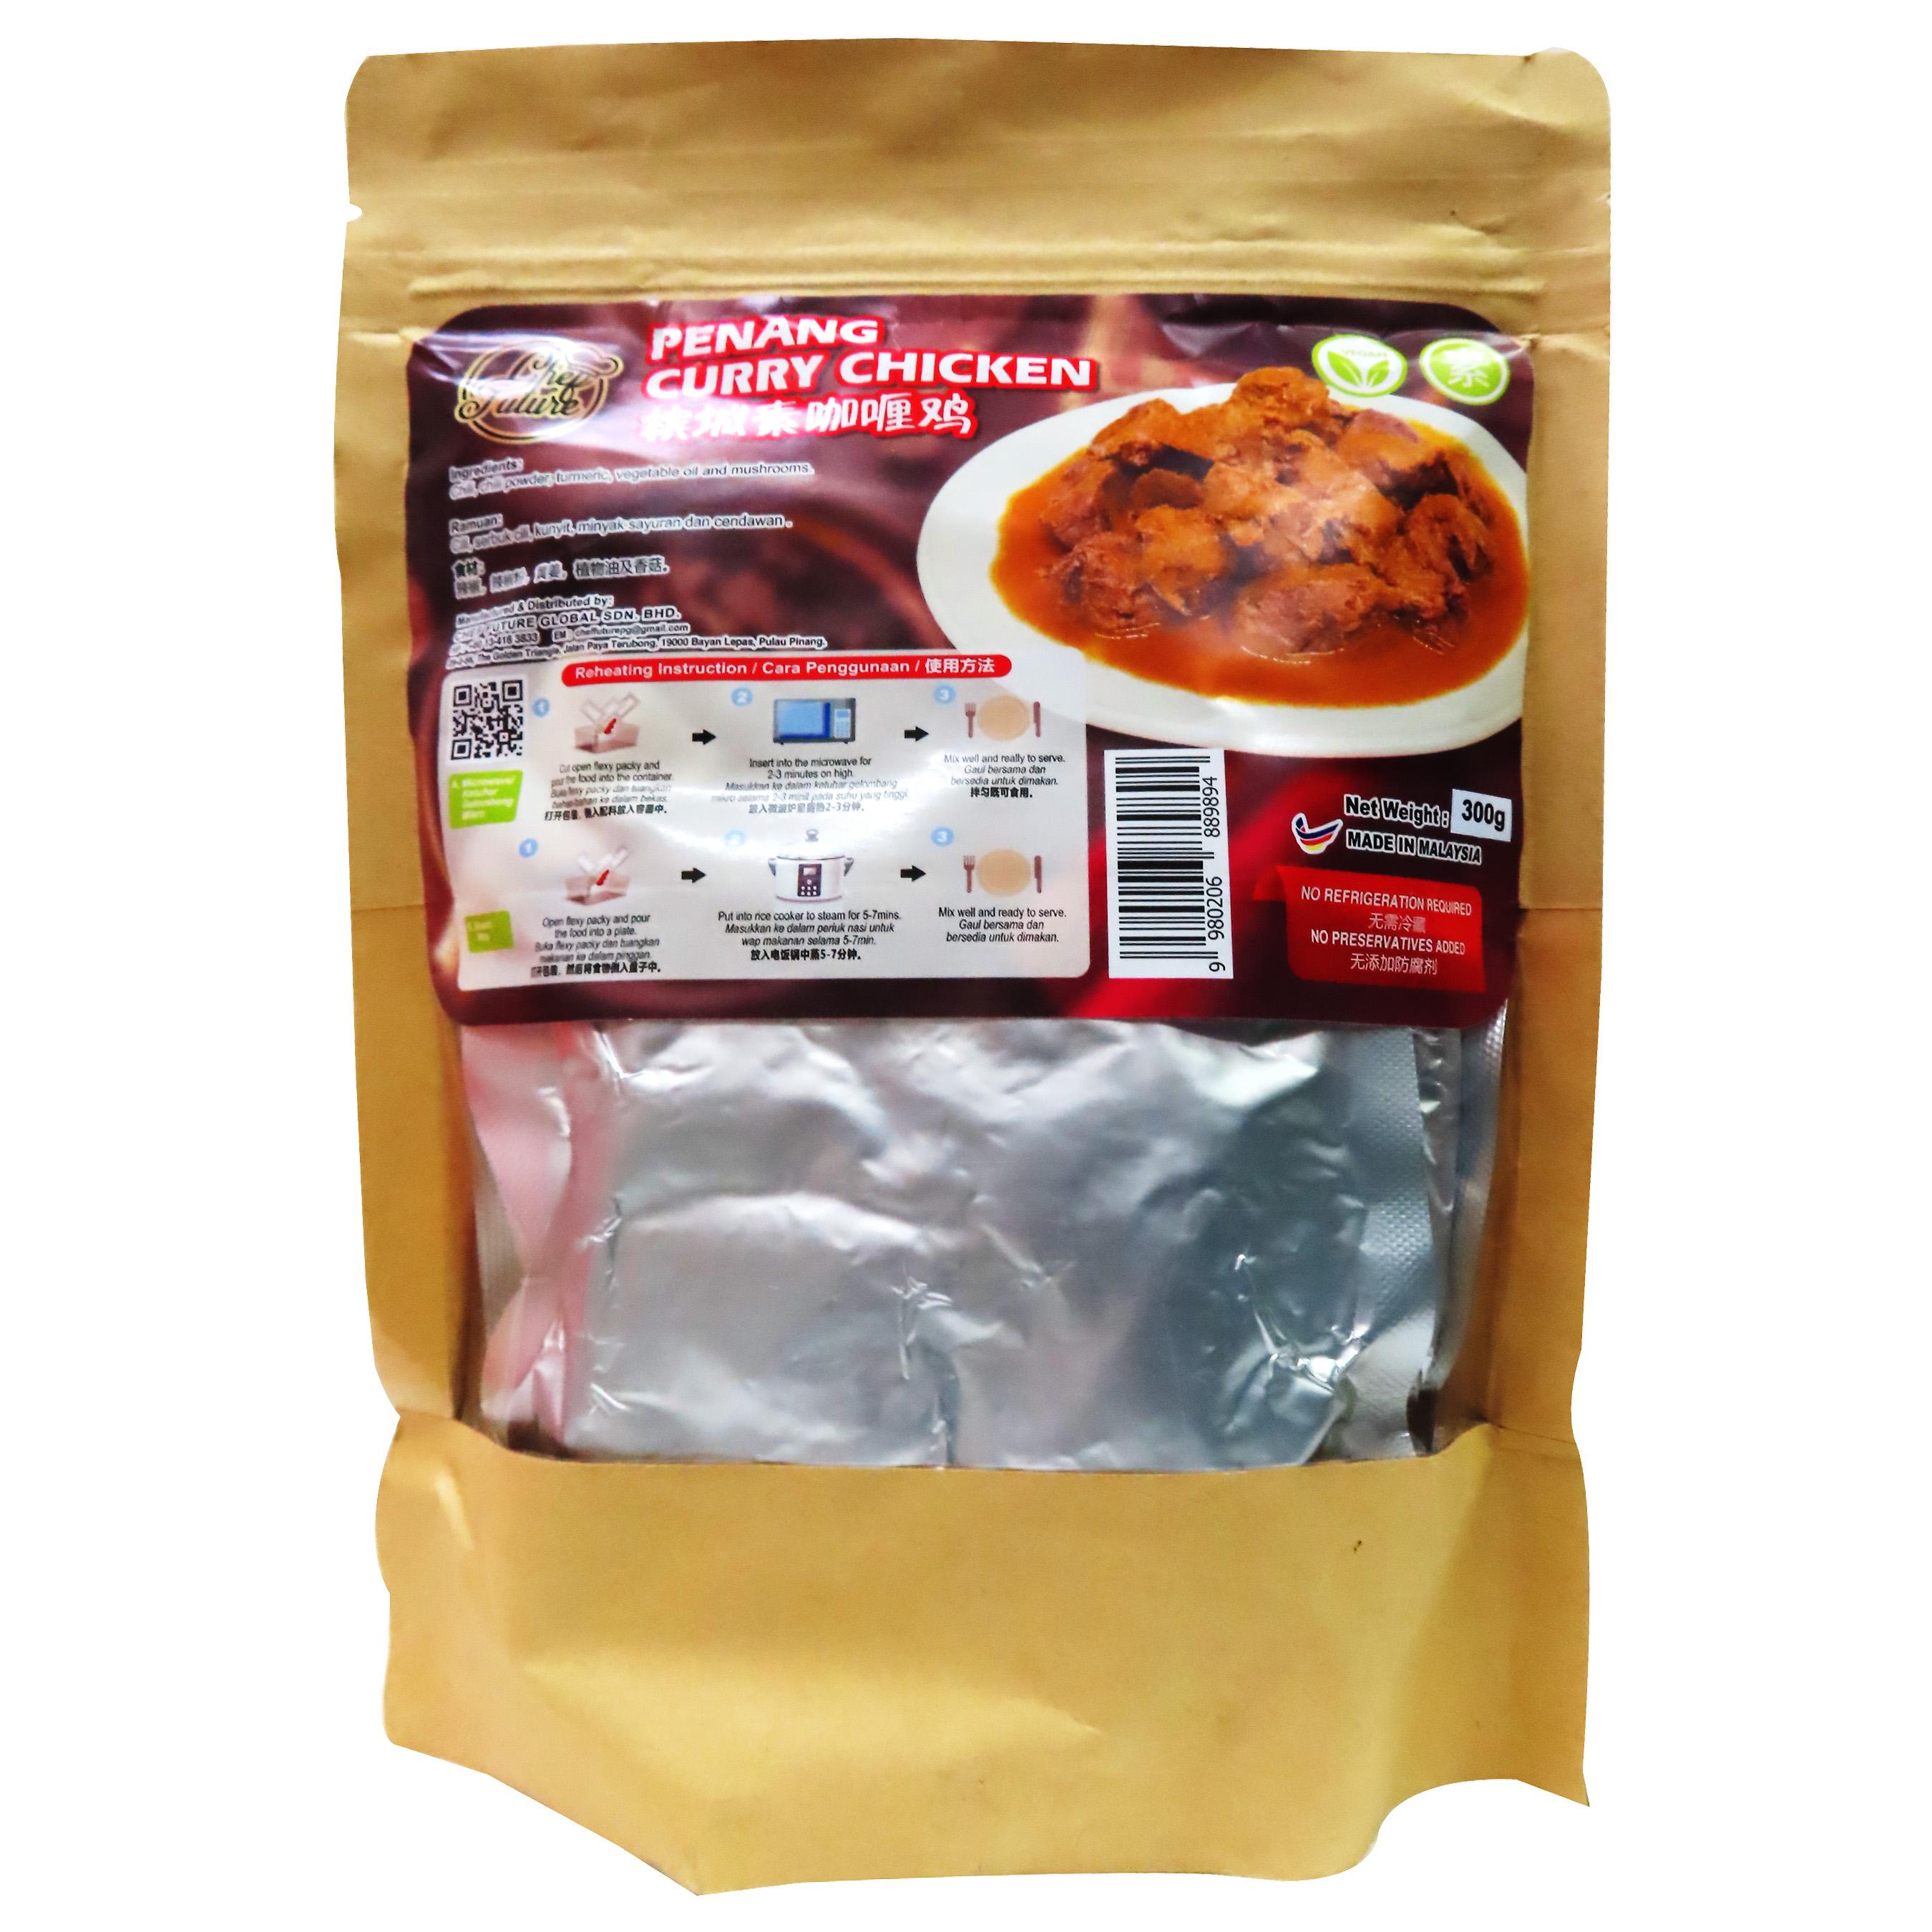 Image Penang Curry Chicken 槟城素咖喱鸡 300grams